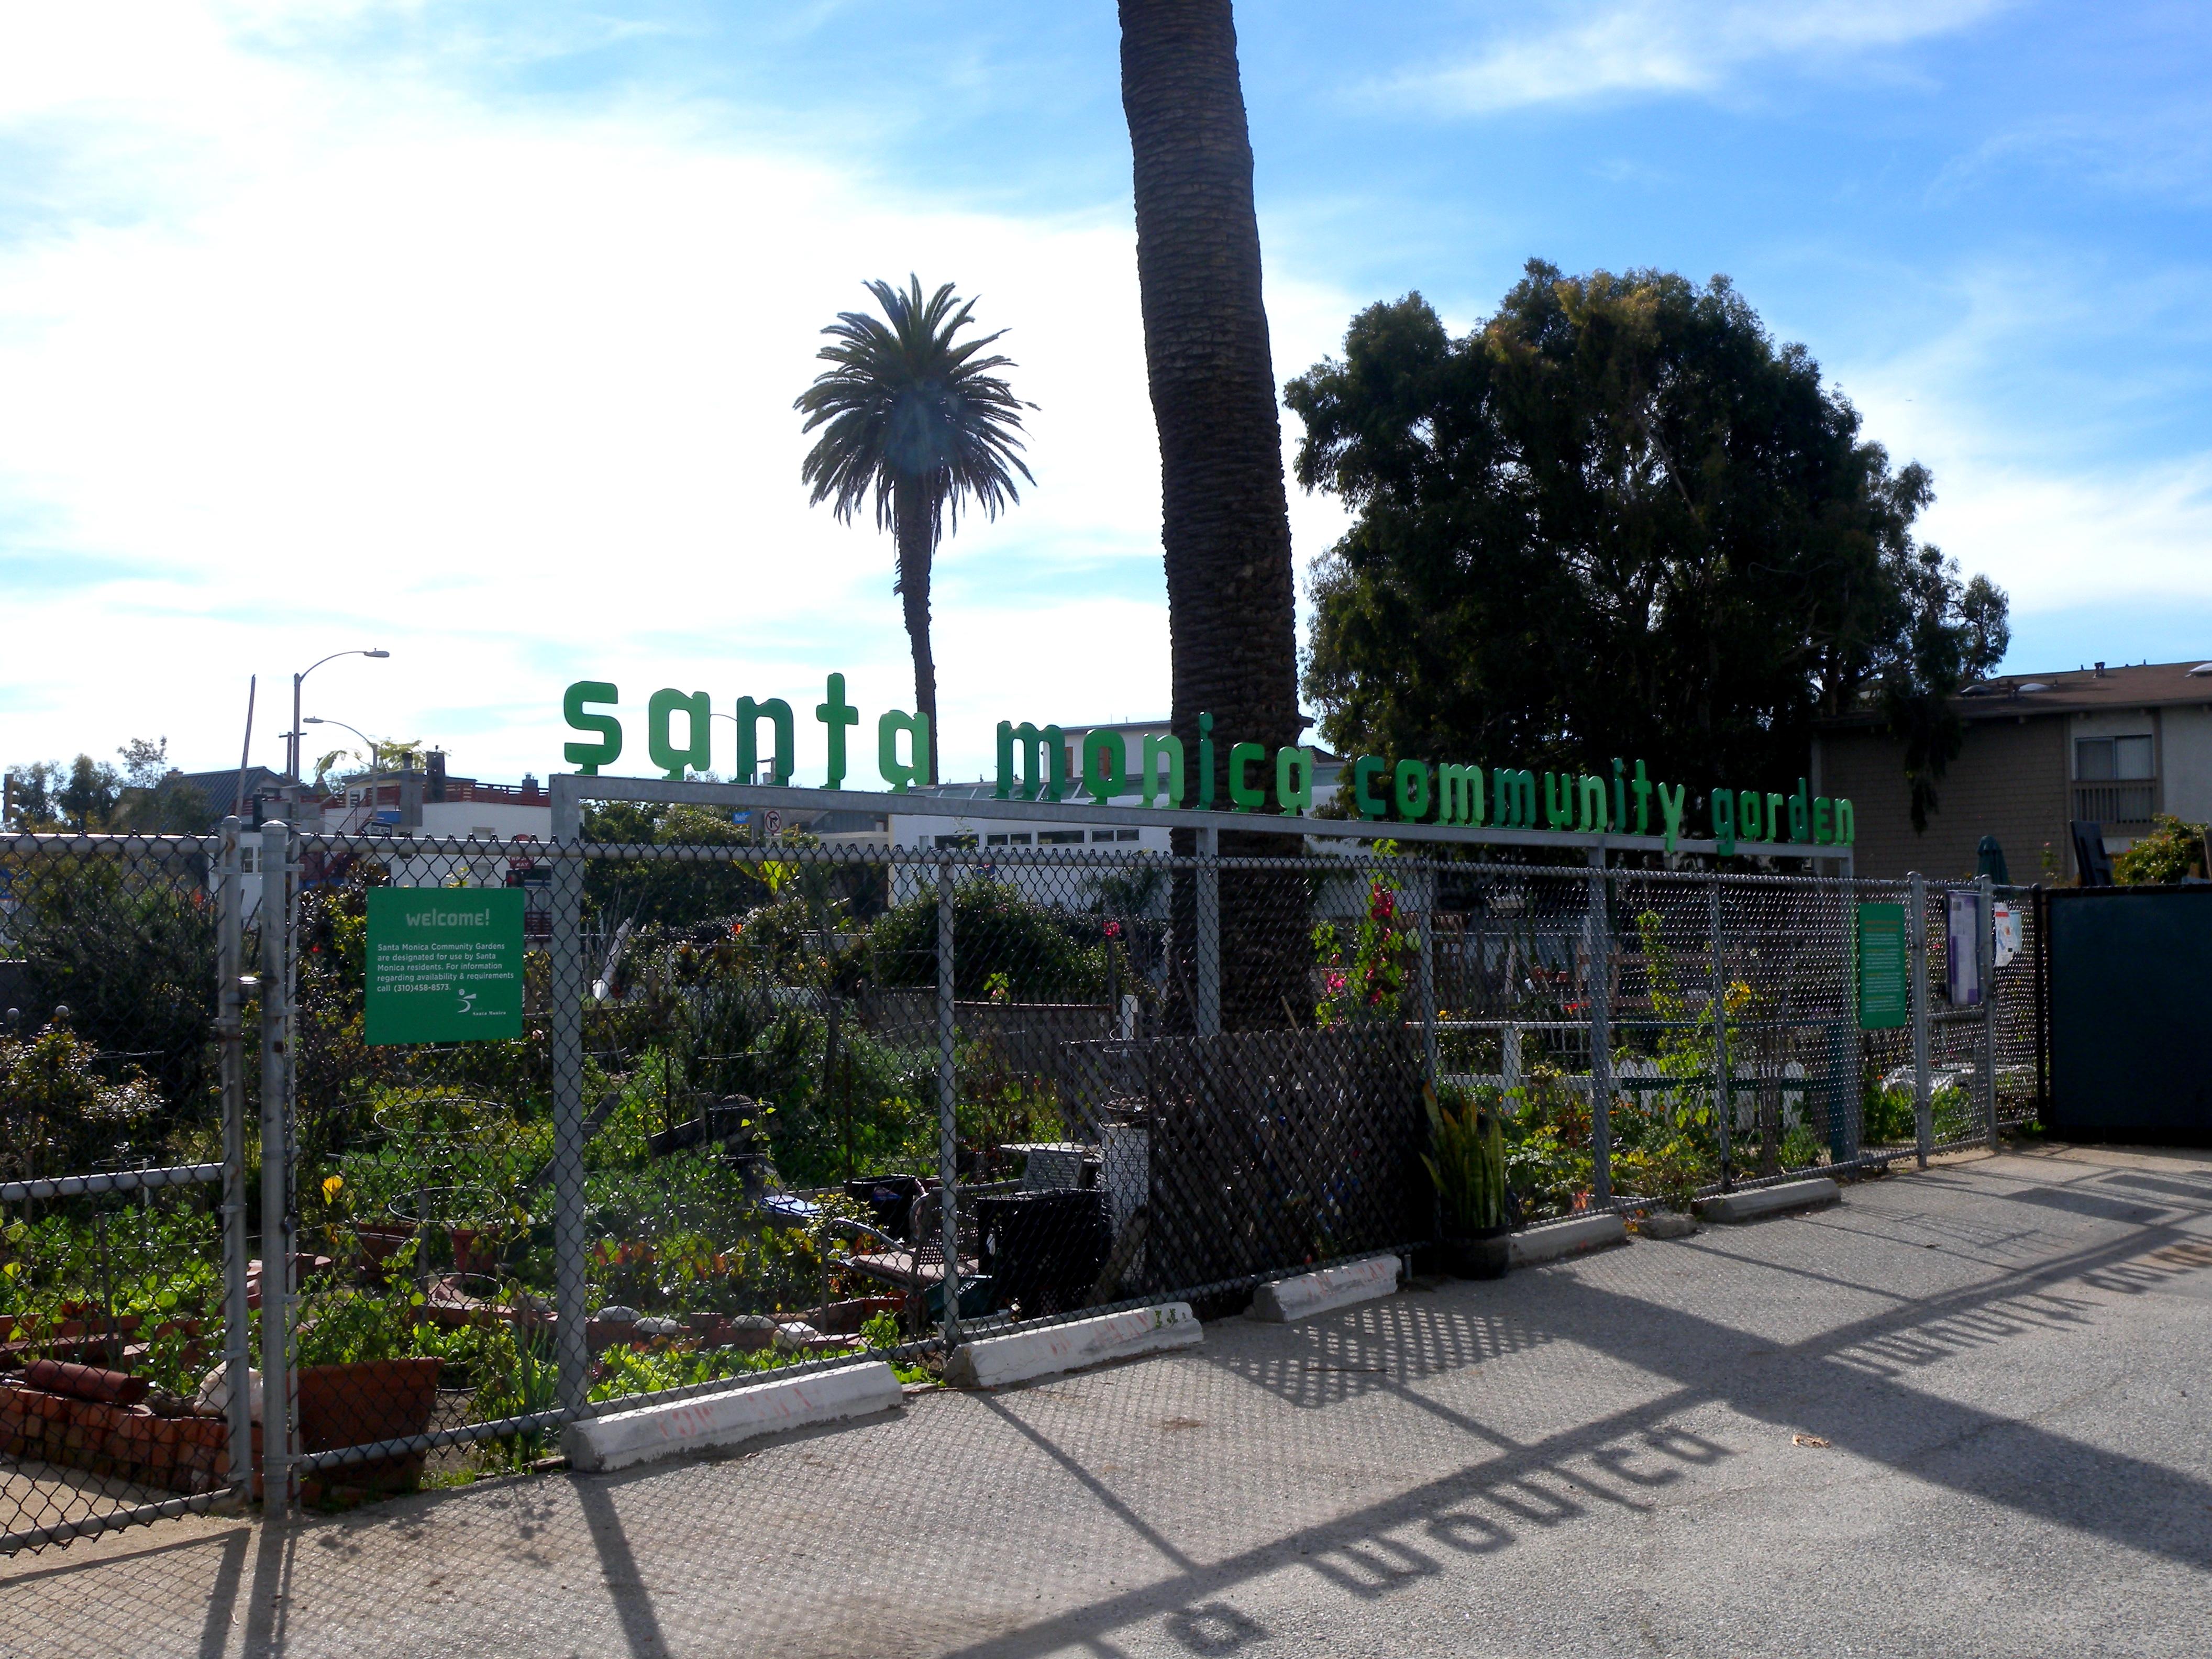 Delightful Santa Monica Community Garden   Main St